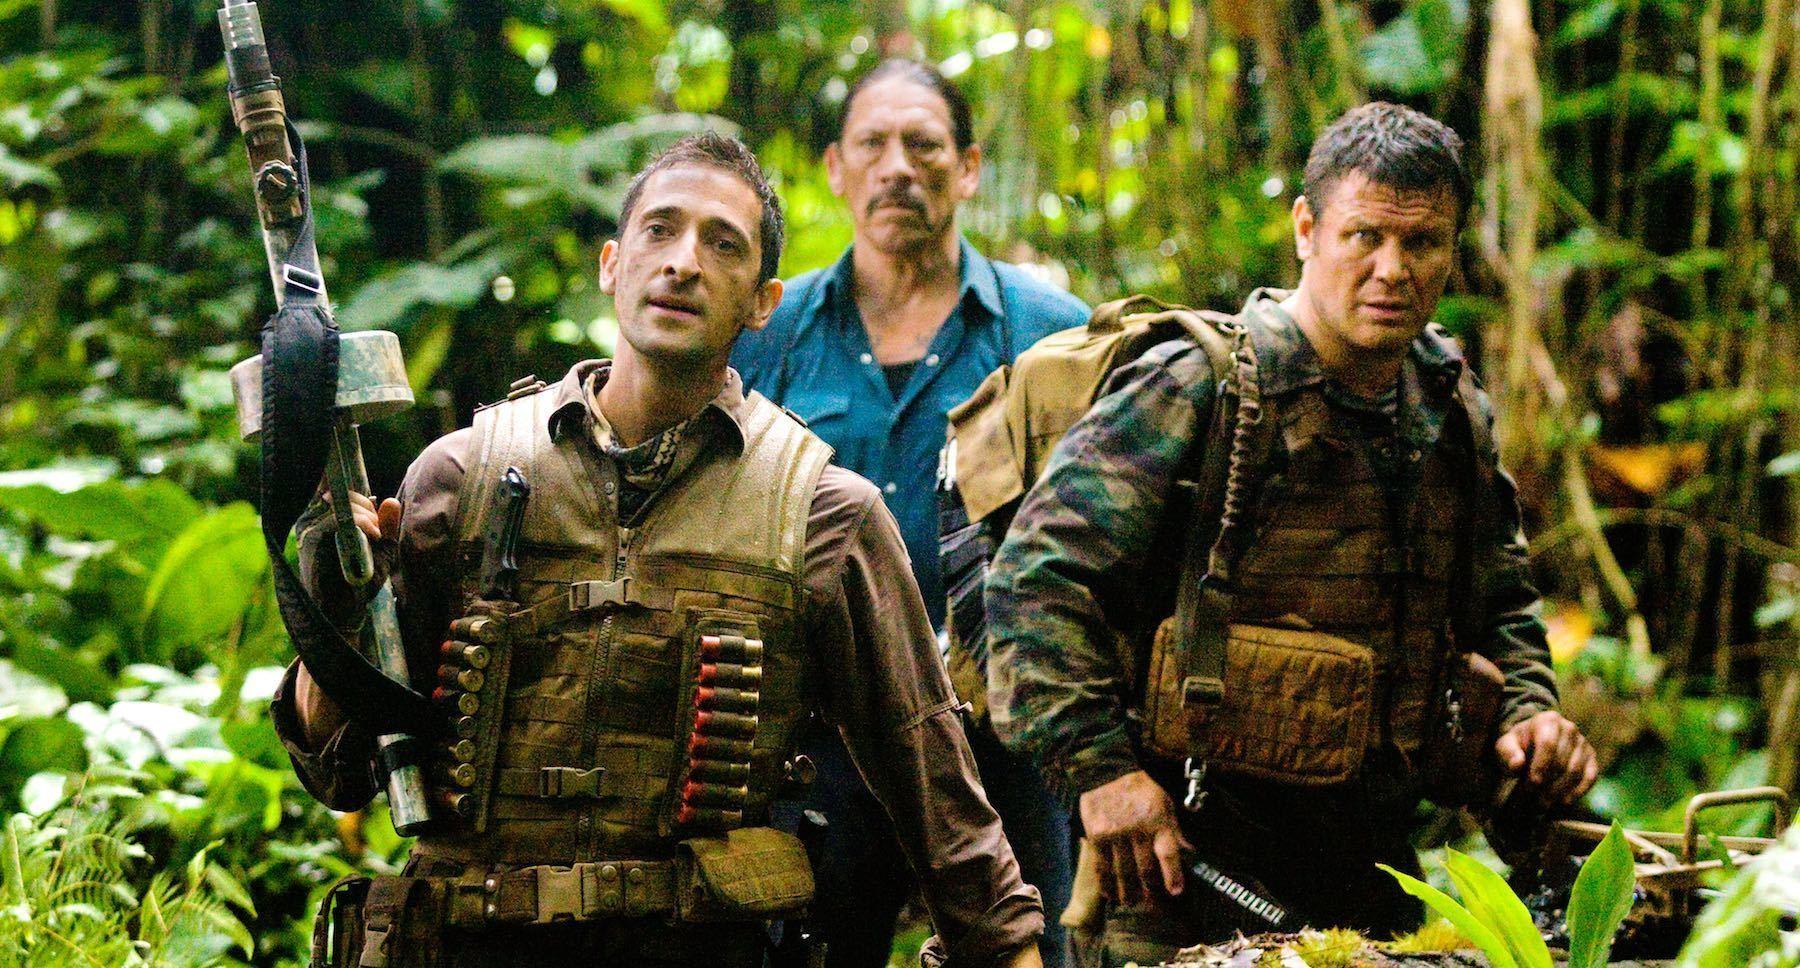 Danny Trejo (as Cuchillo), Adrien Brody (as Royce),  and Oleg Taktarov (as Nikolai) in Predators